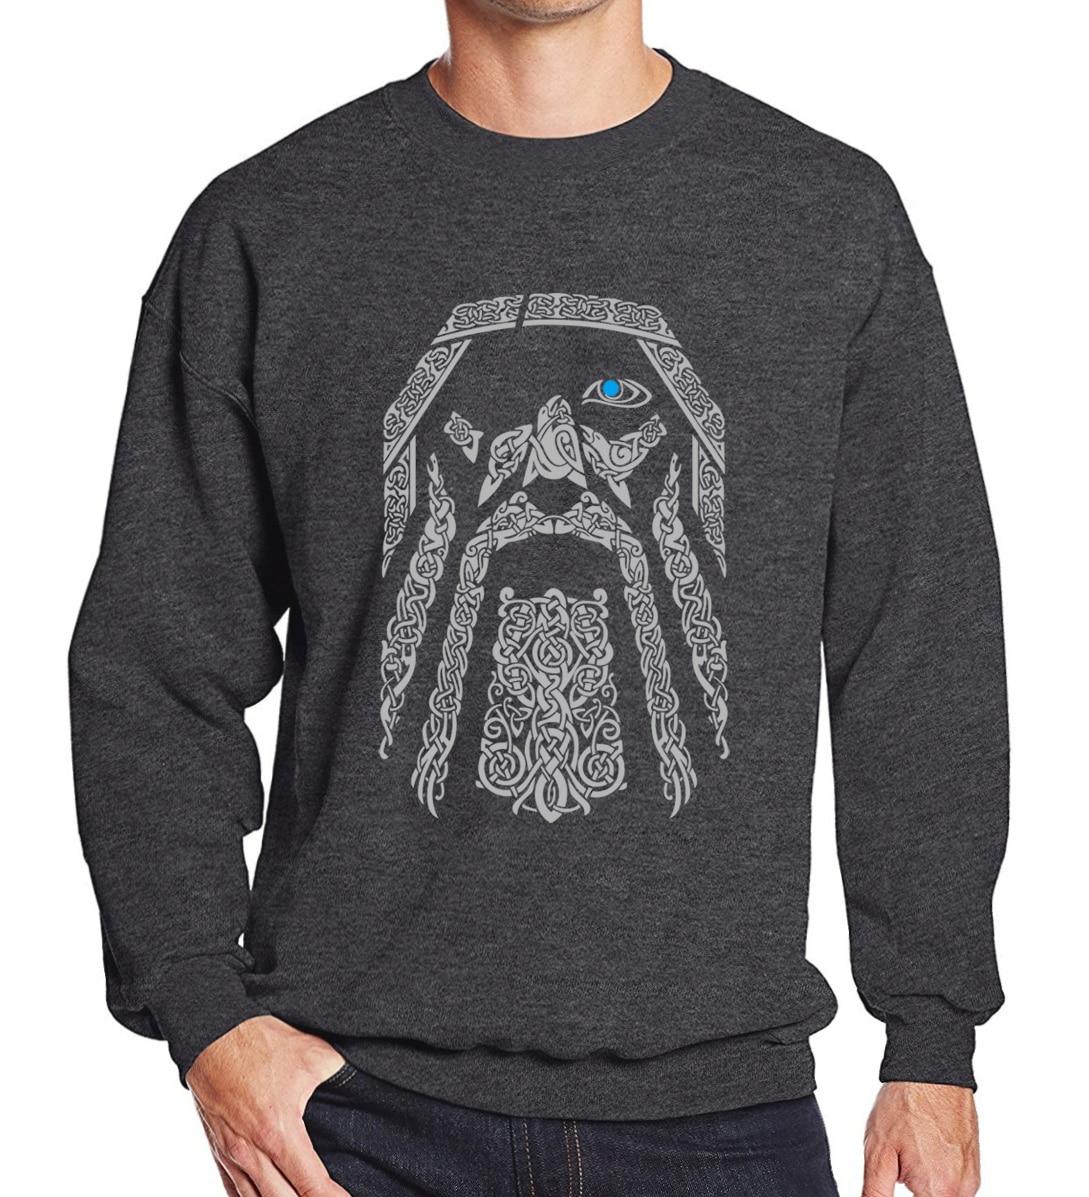 autumn sweatshirt tracksuit man Odin Vikings hoodies for men 2019 unisex fashion regular sleeve clothing o-neck casual pullovers